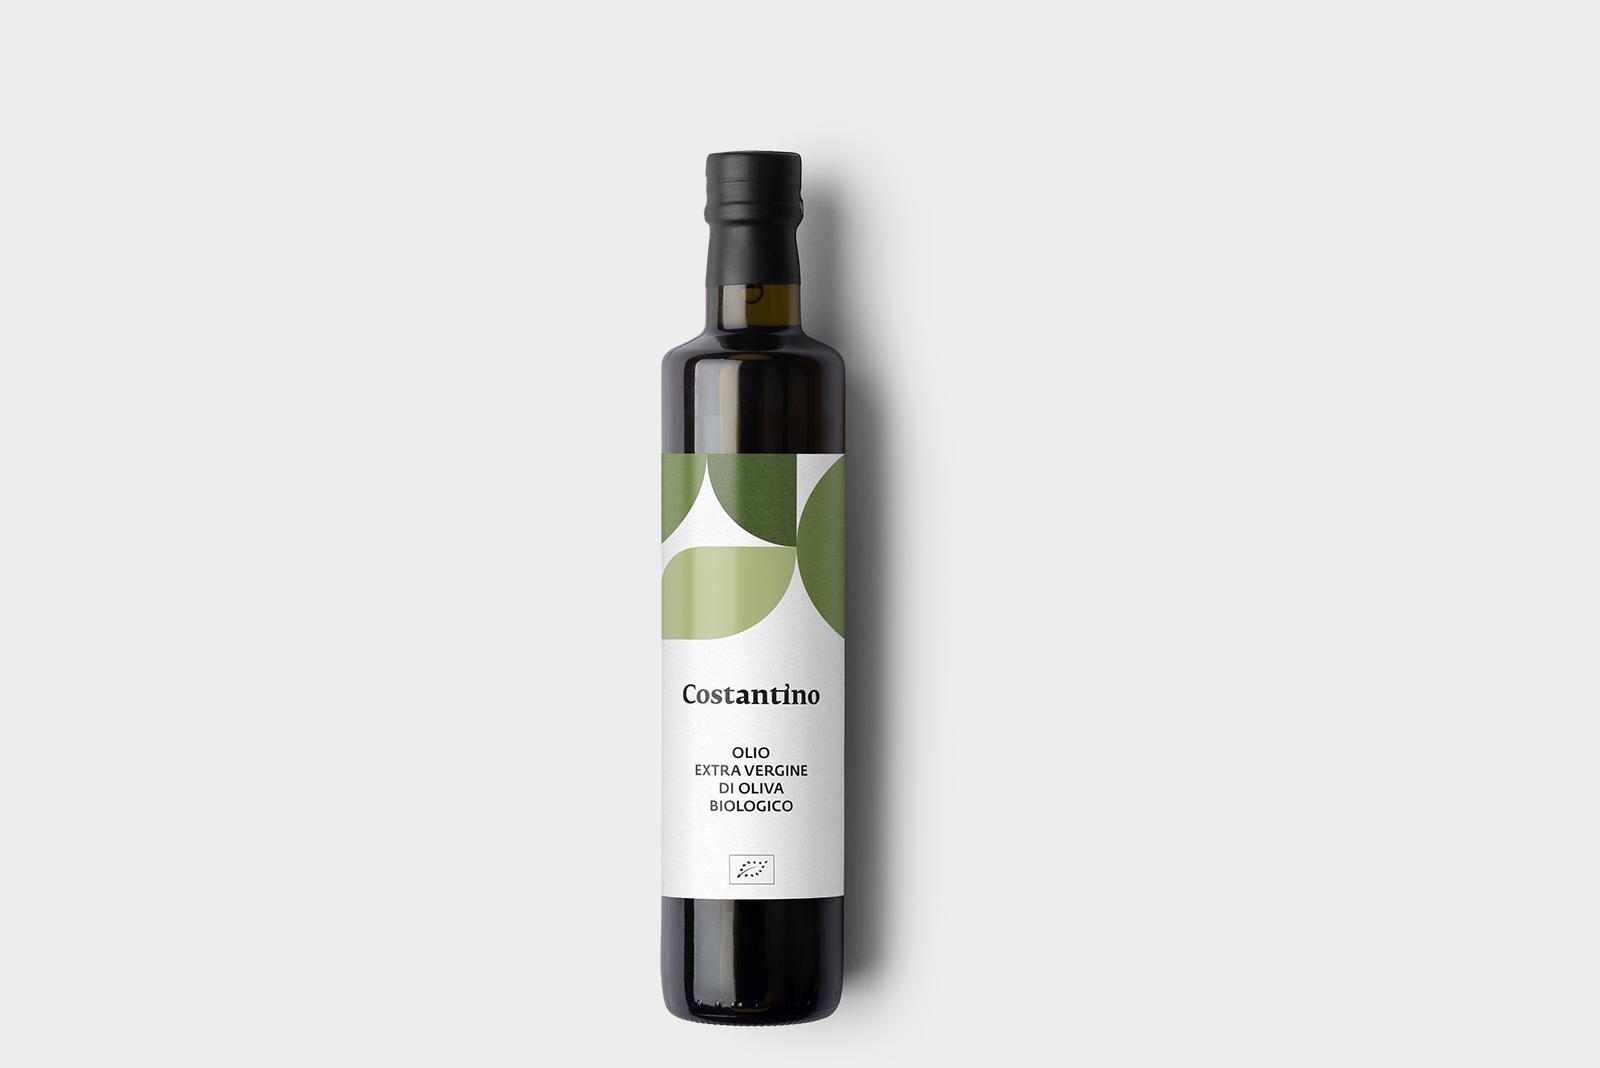 Costantino - Olio Extra Vergine d'Oliva Biologico - bottiglia 75cl